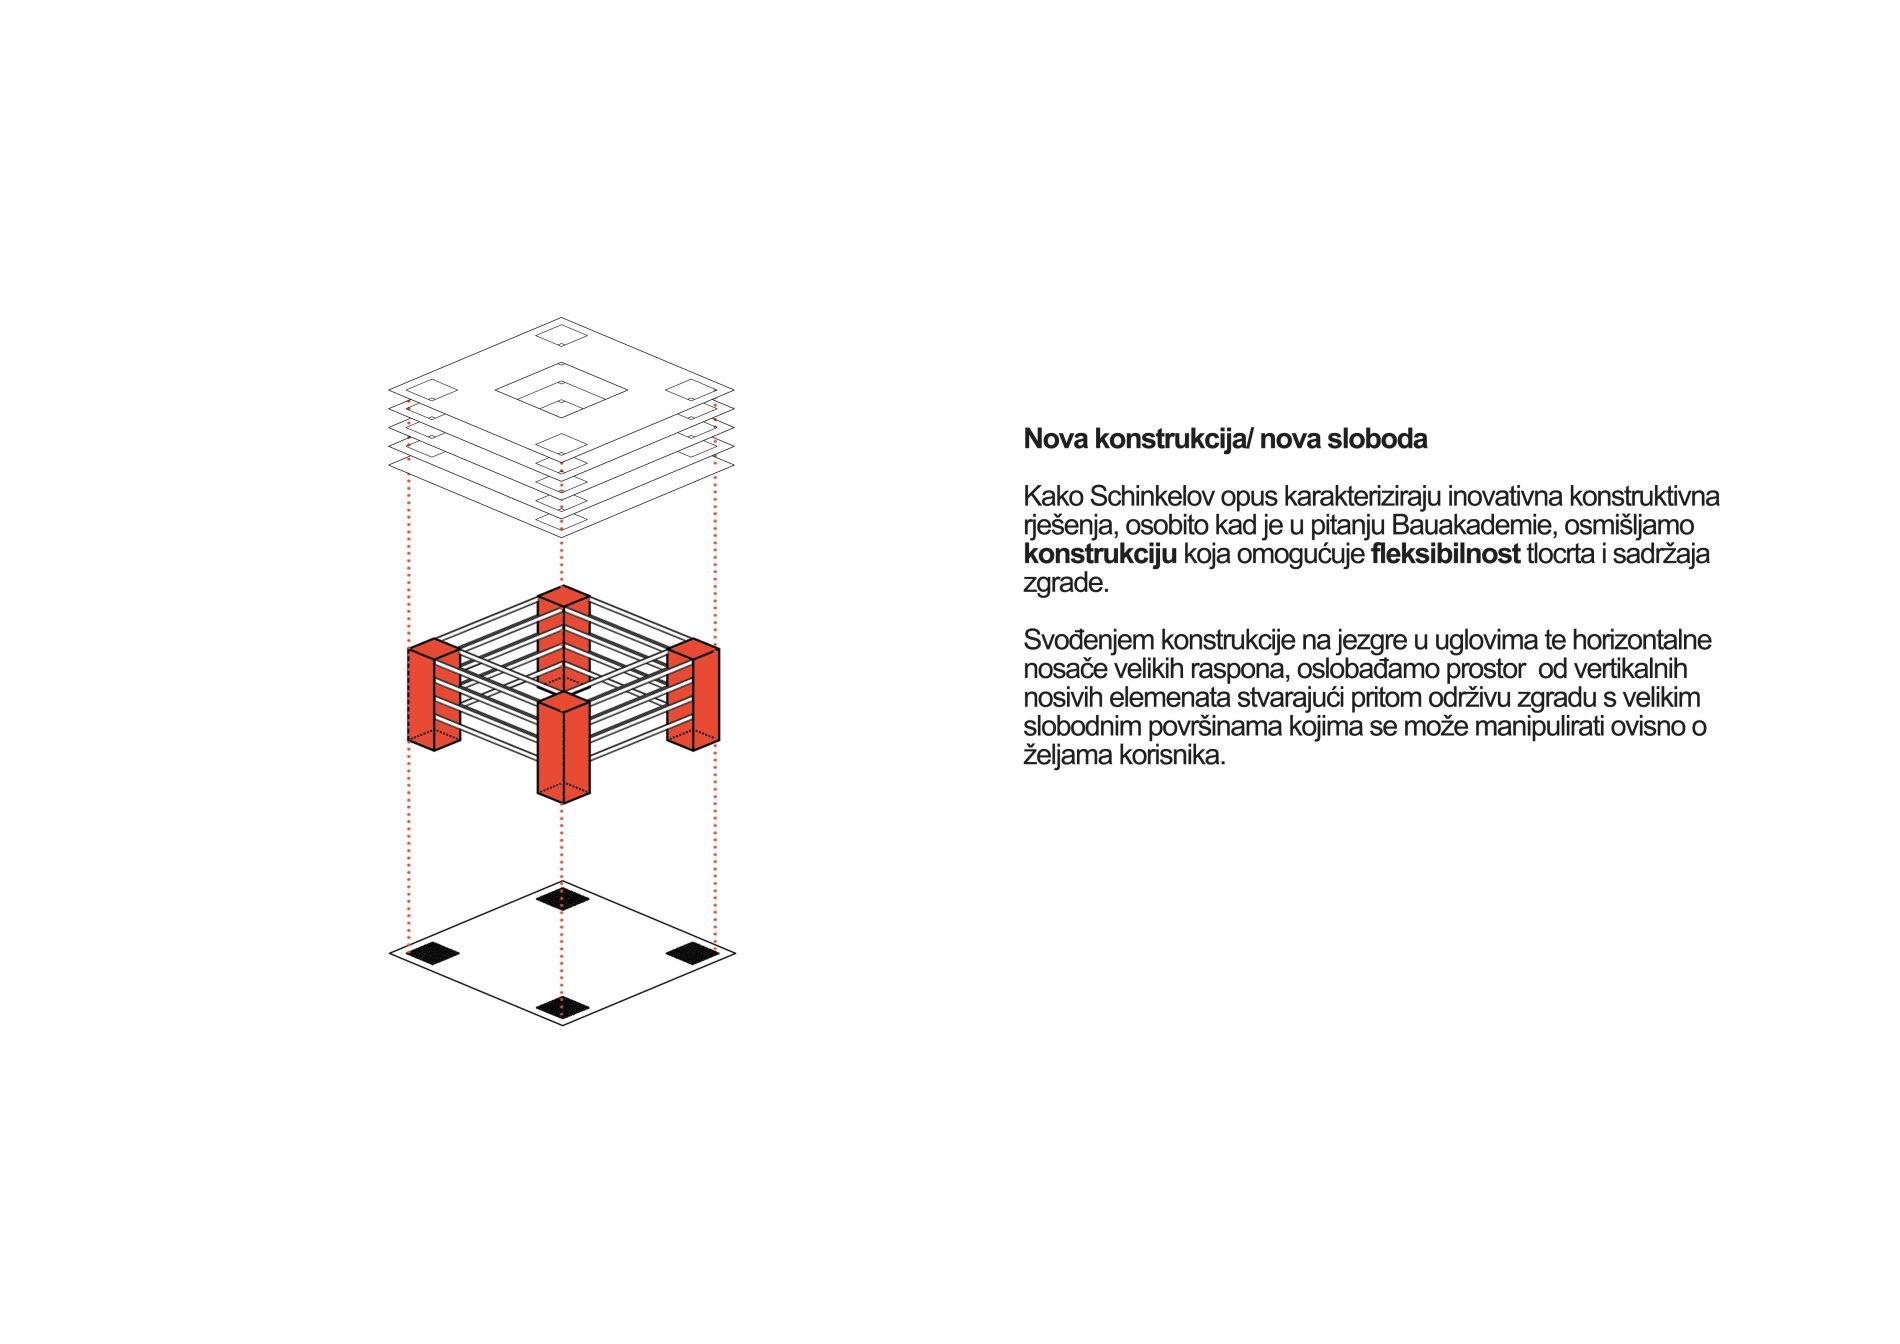 neue bauakademie, neuebauakademie, bauakademie, upi-2, stručna praksa zagreb, arhitektura, competition, natječja, međunarodni arhitektonski natječaj, stručna praksa arhitektura